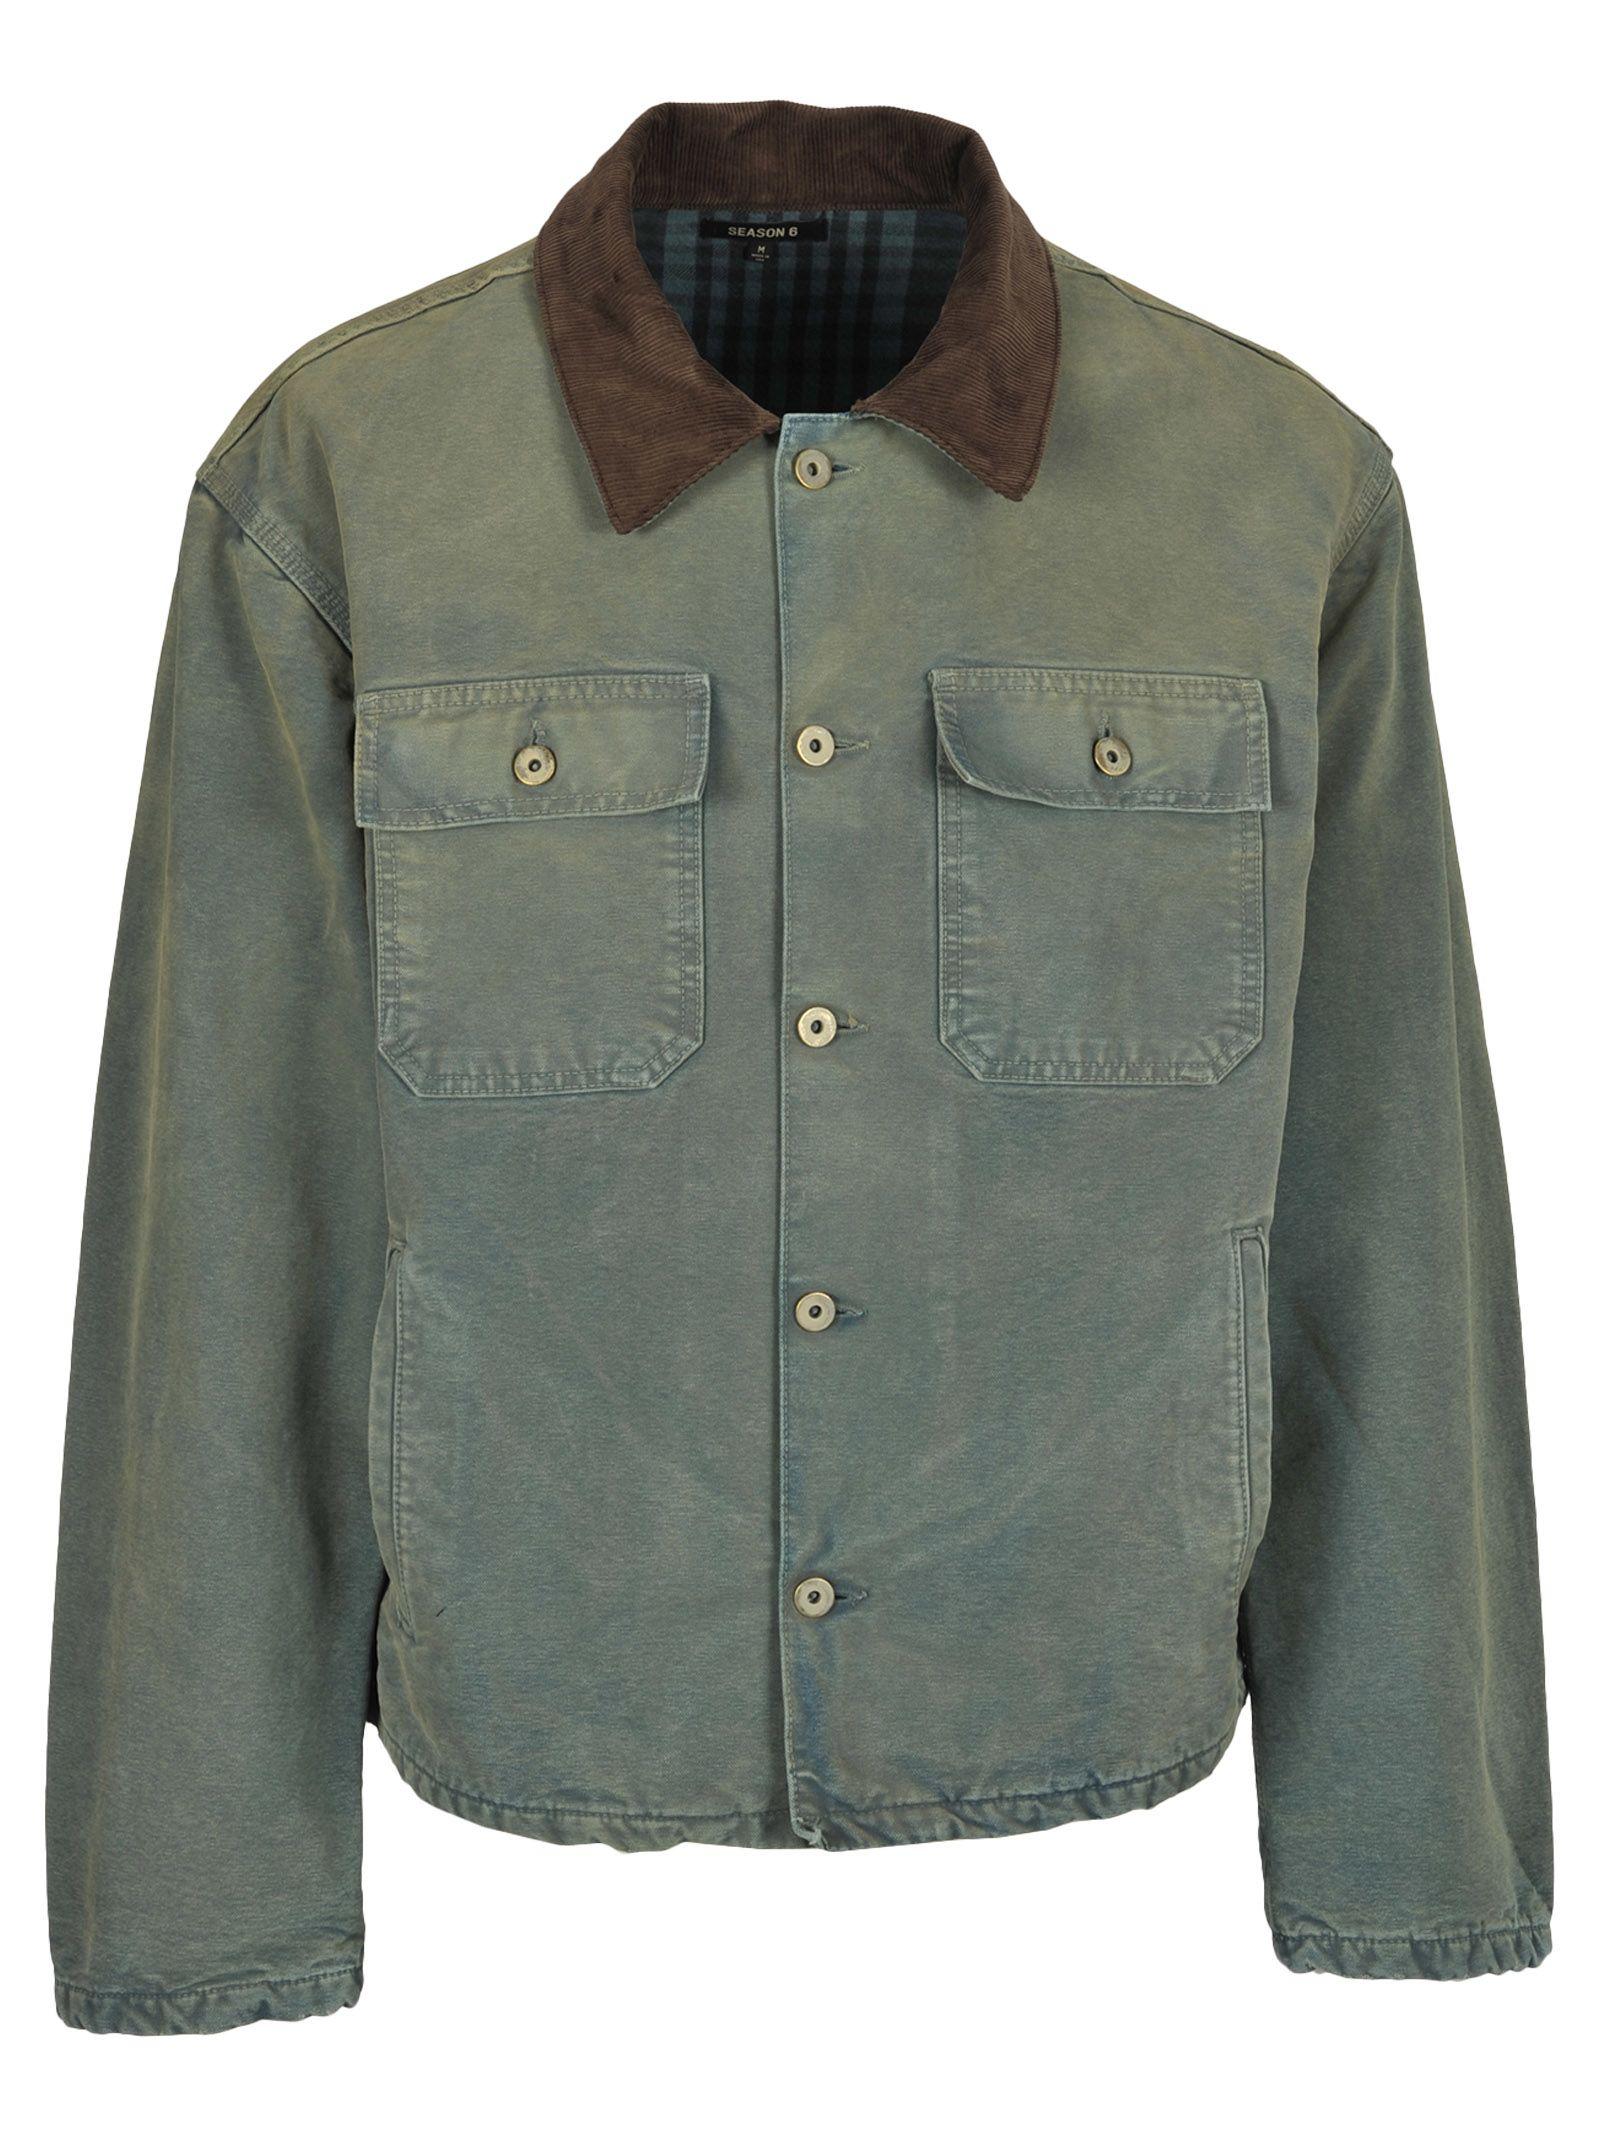 Yeezy Kanye West Canvas Jacket